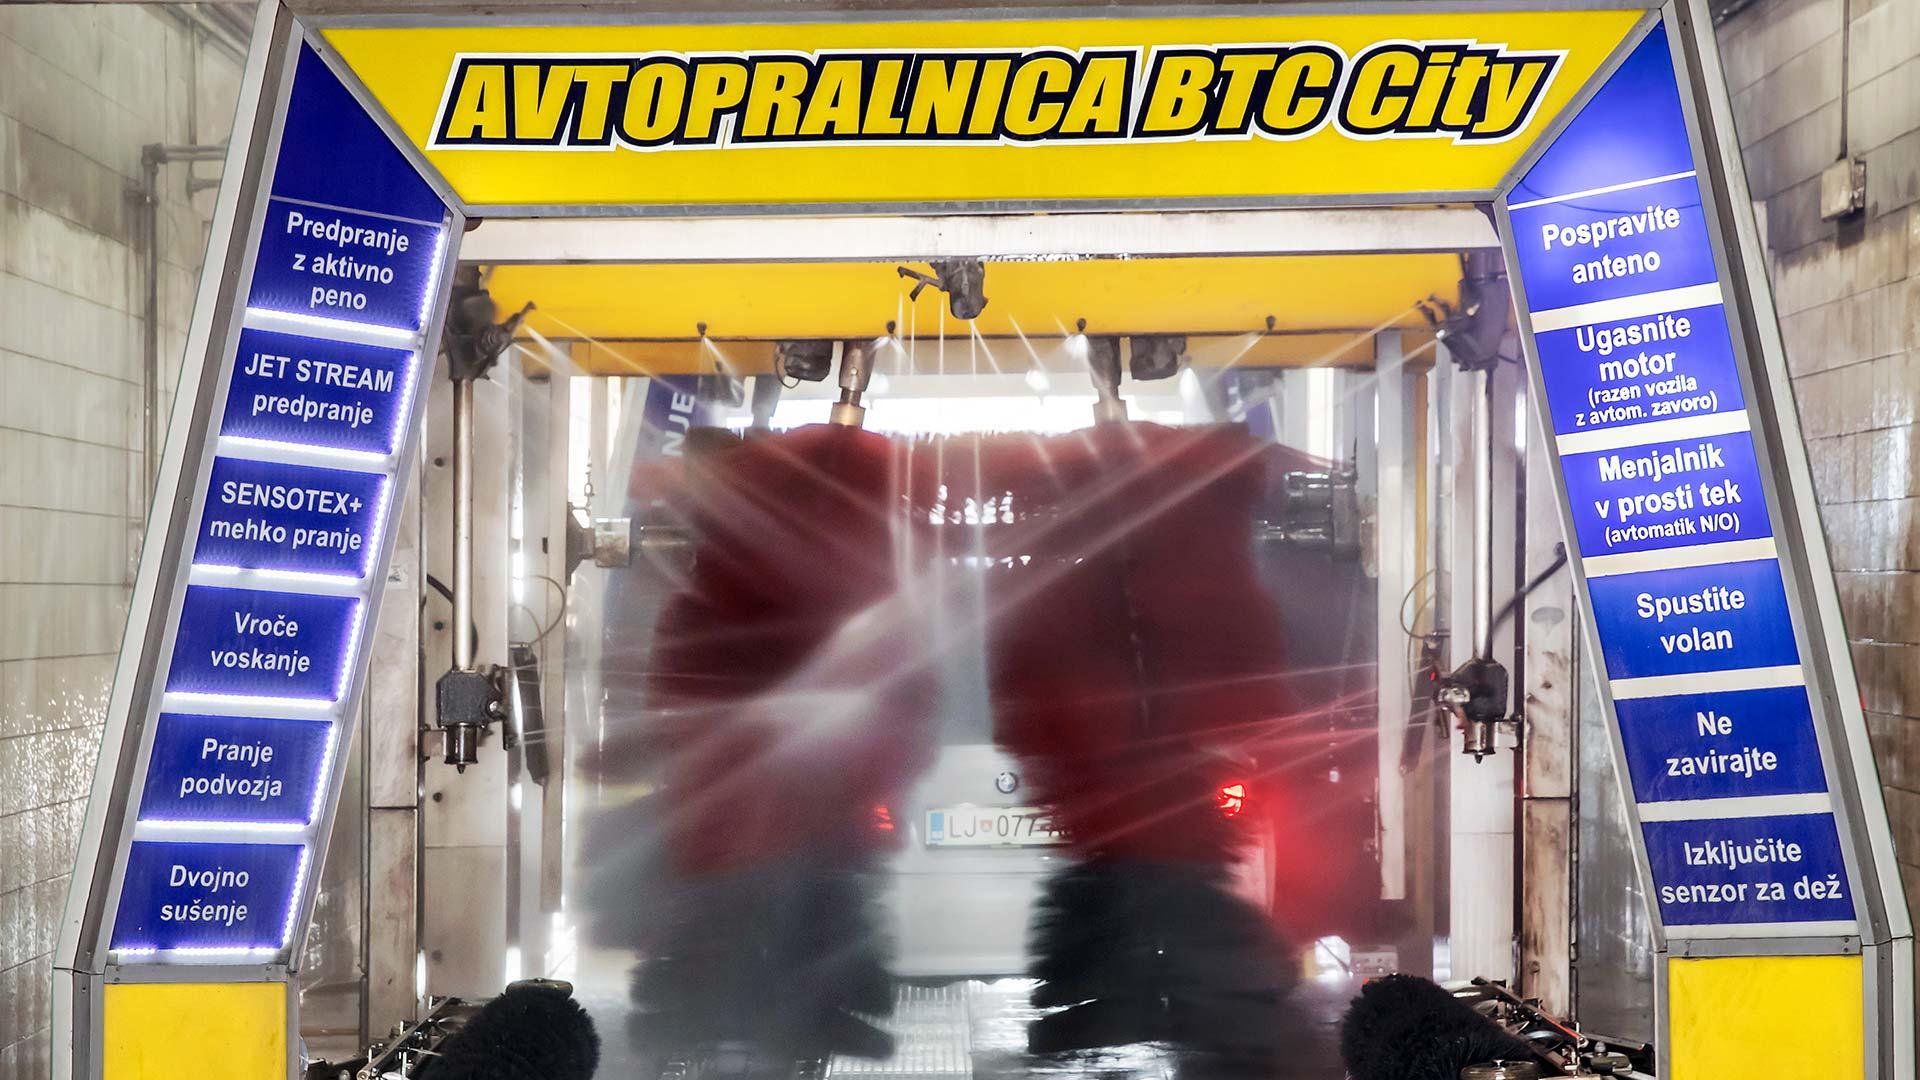 Avtopralnica BTC City